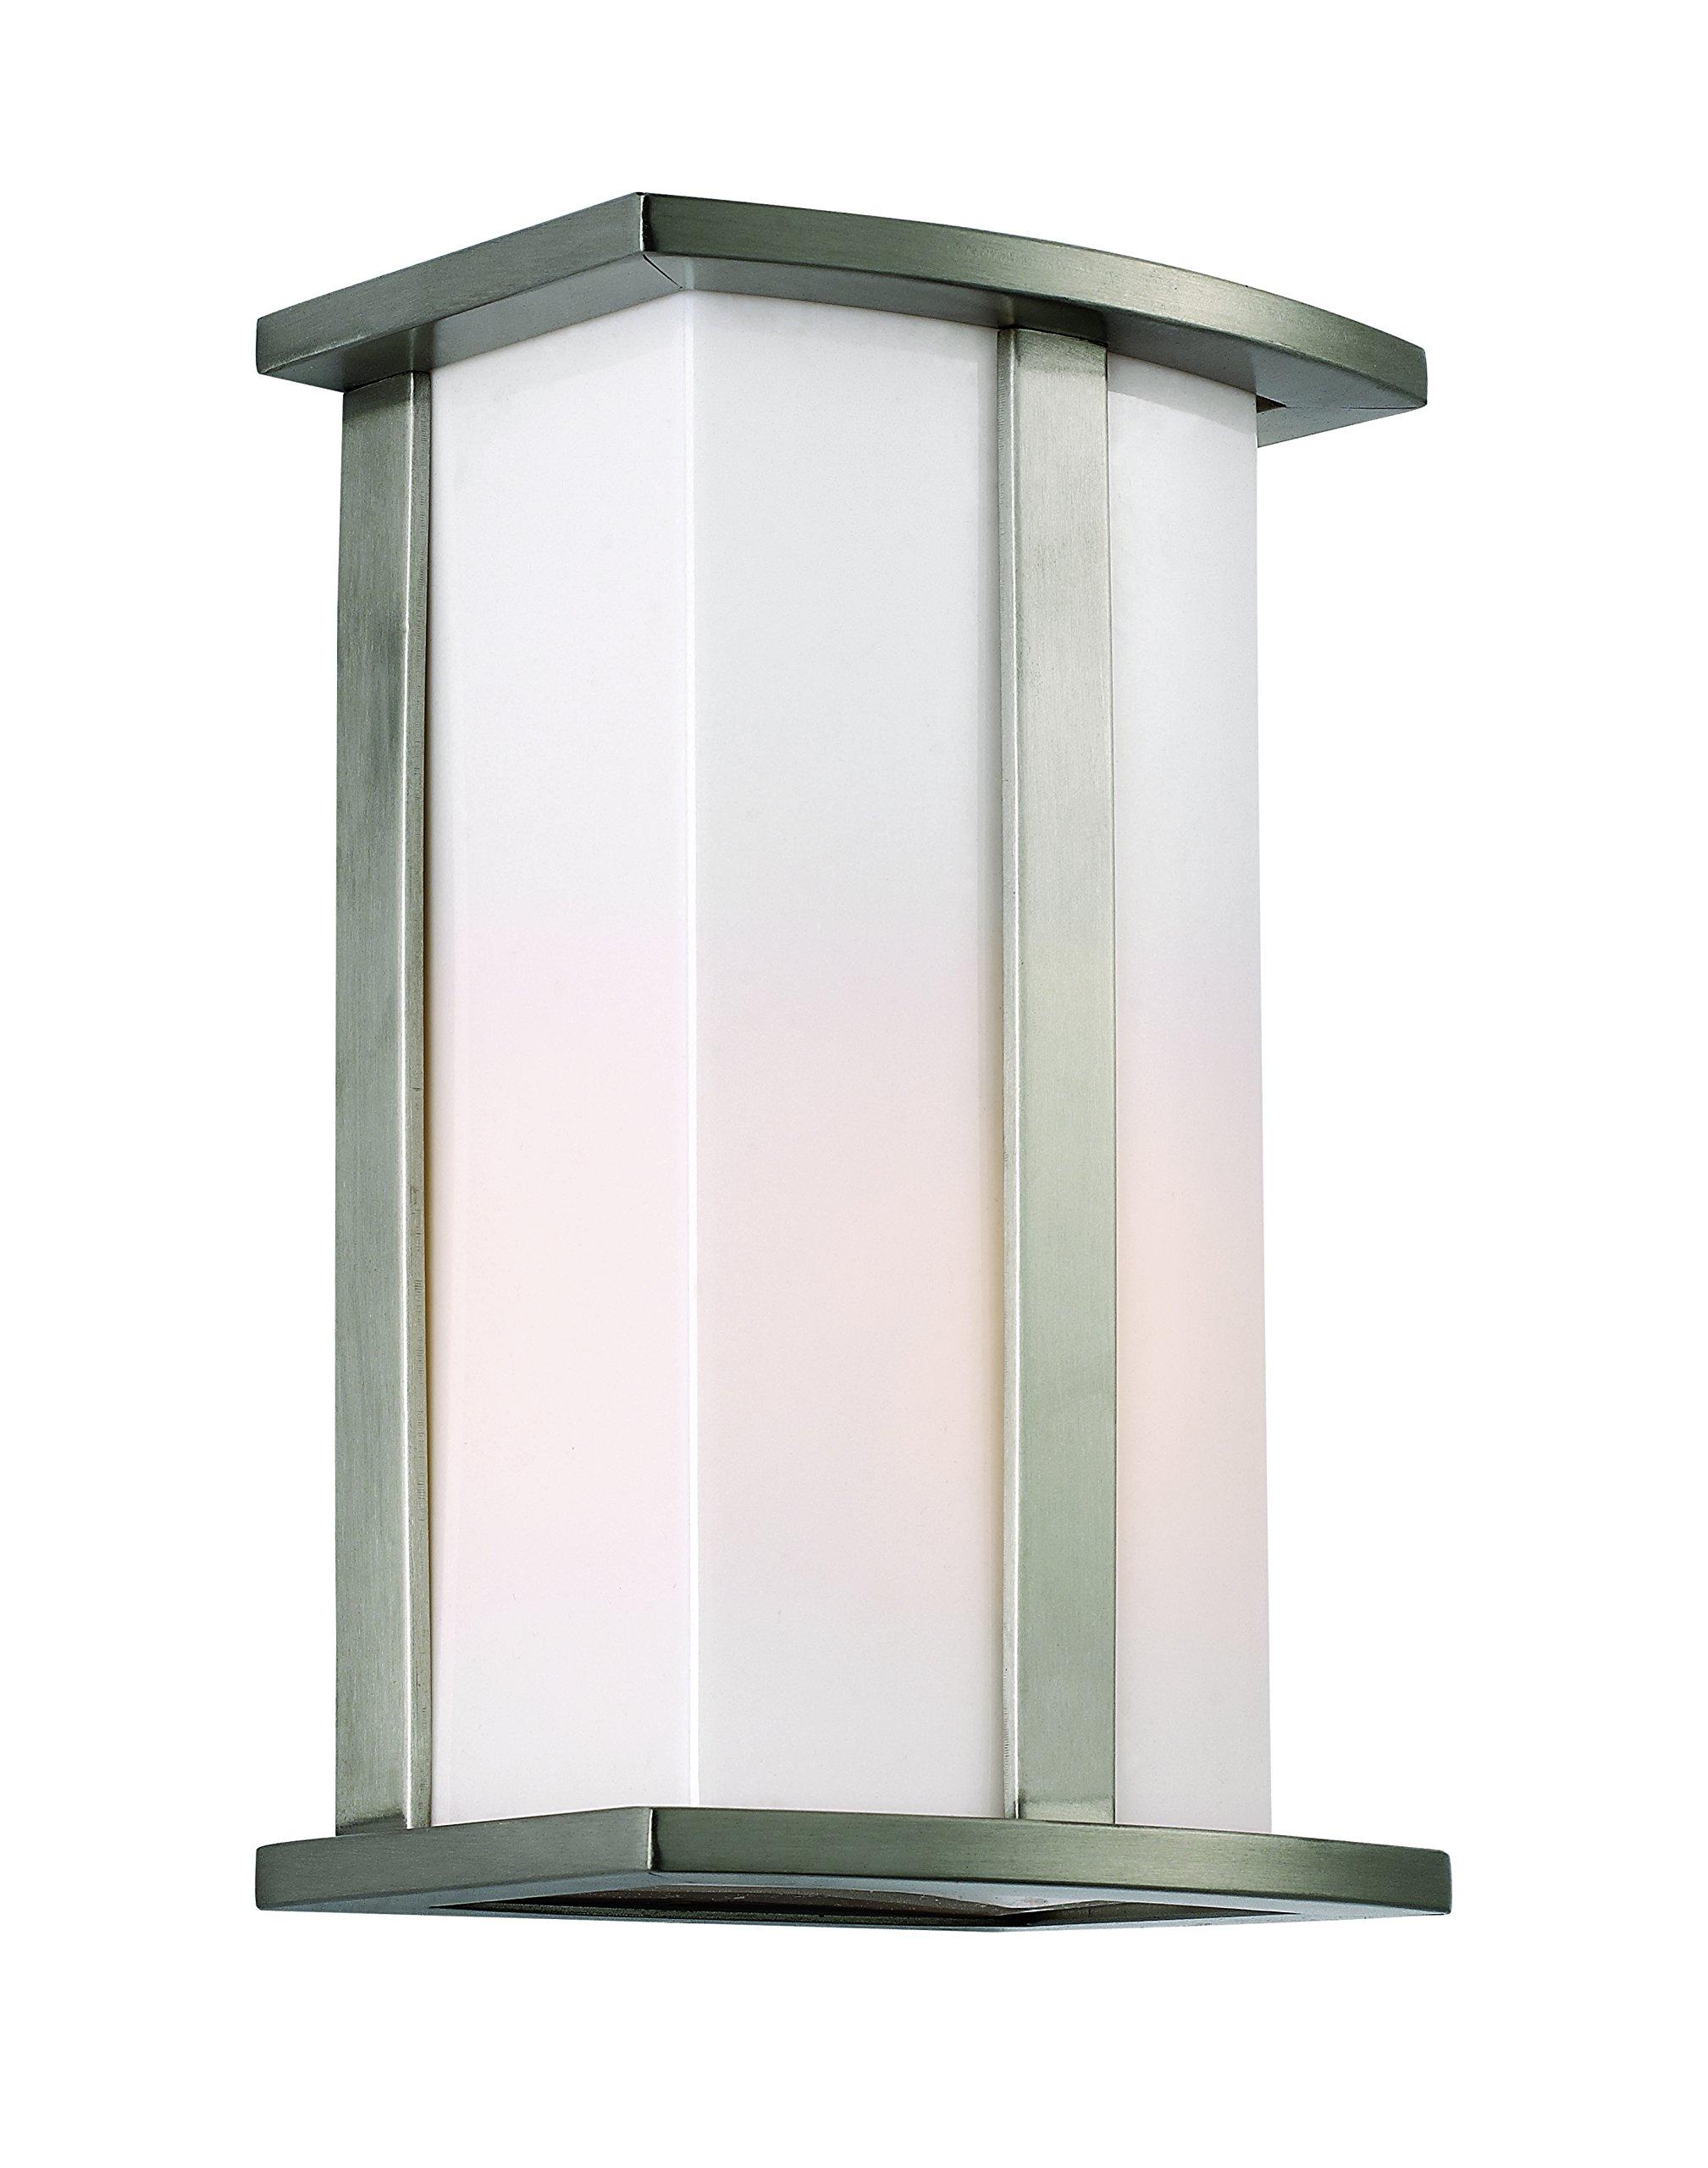 Trans Globe Lighting 40290 ST Outdoor Chime 10'' Pocket Lantern, Steel